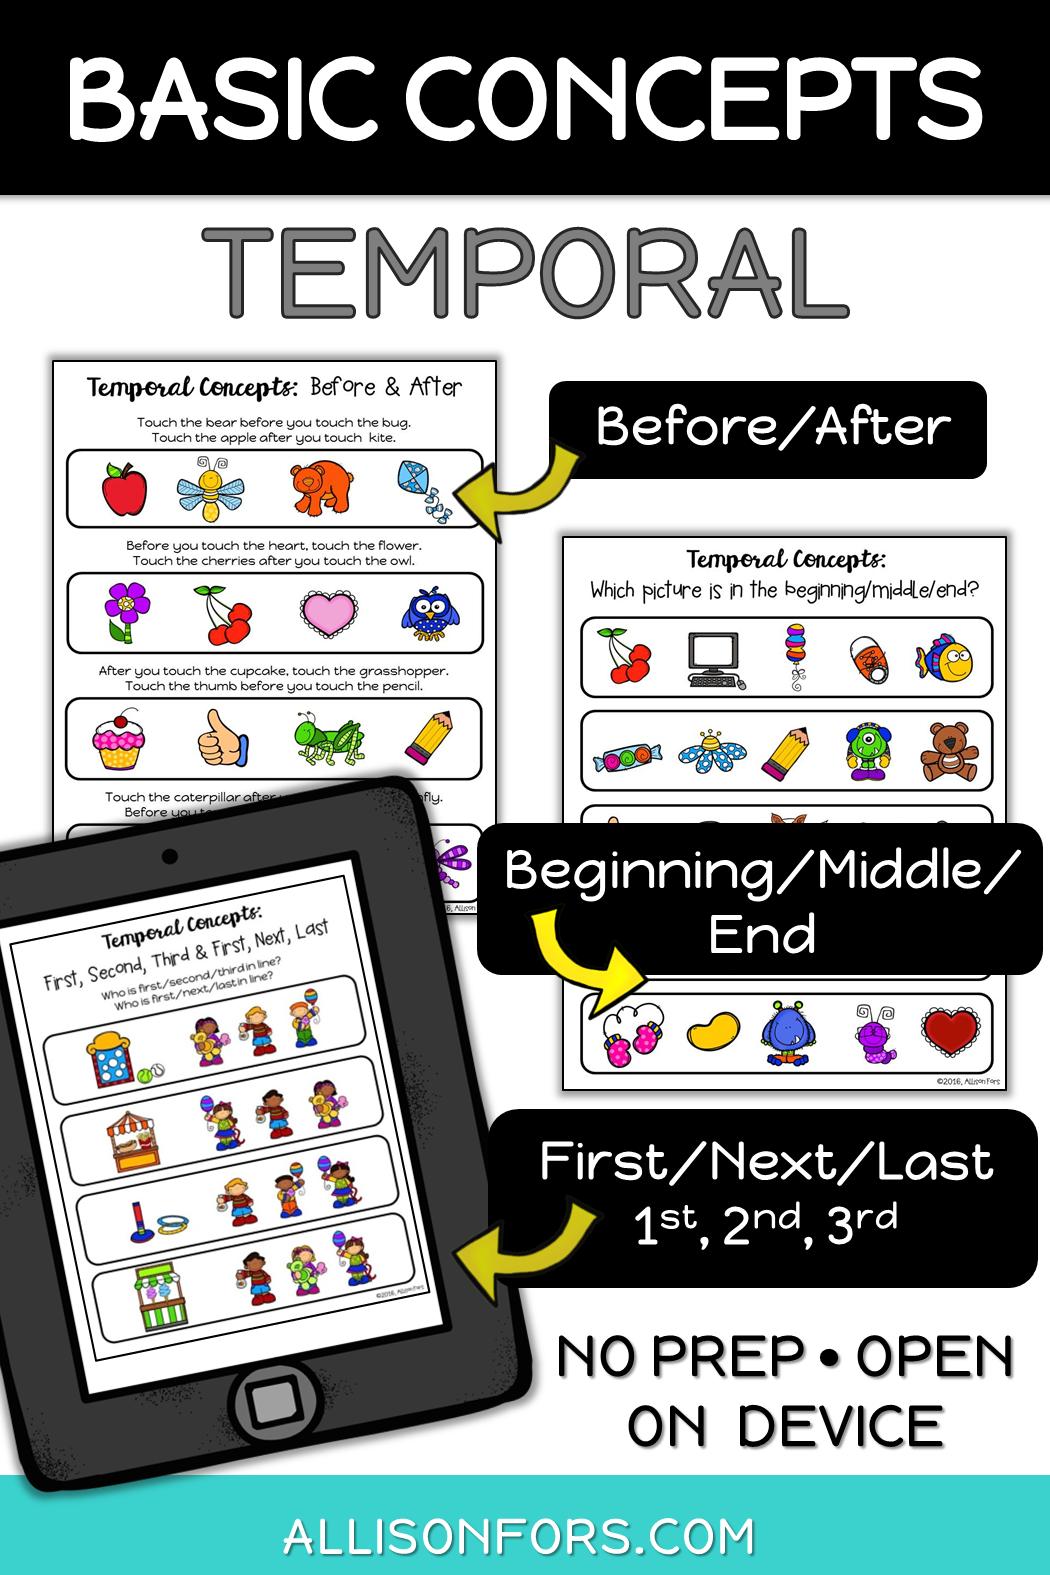 Basic Concepts Temporal Concepts No Prep